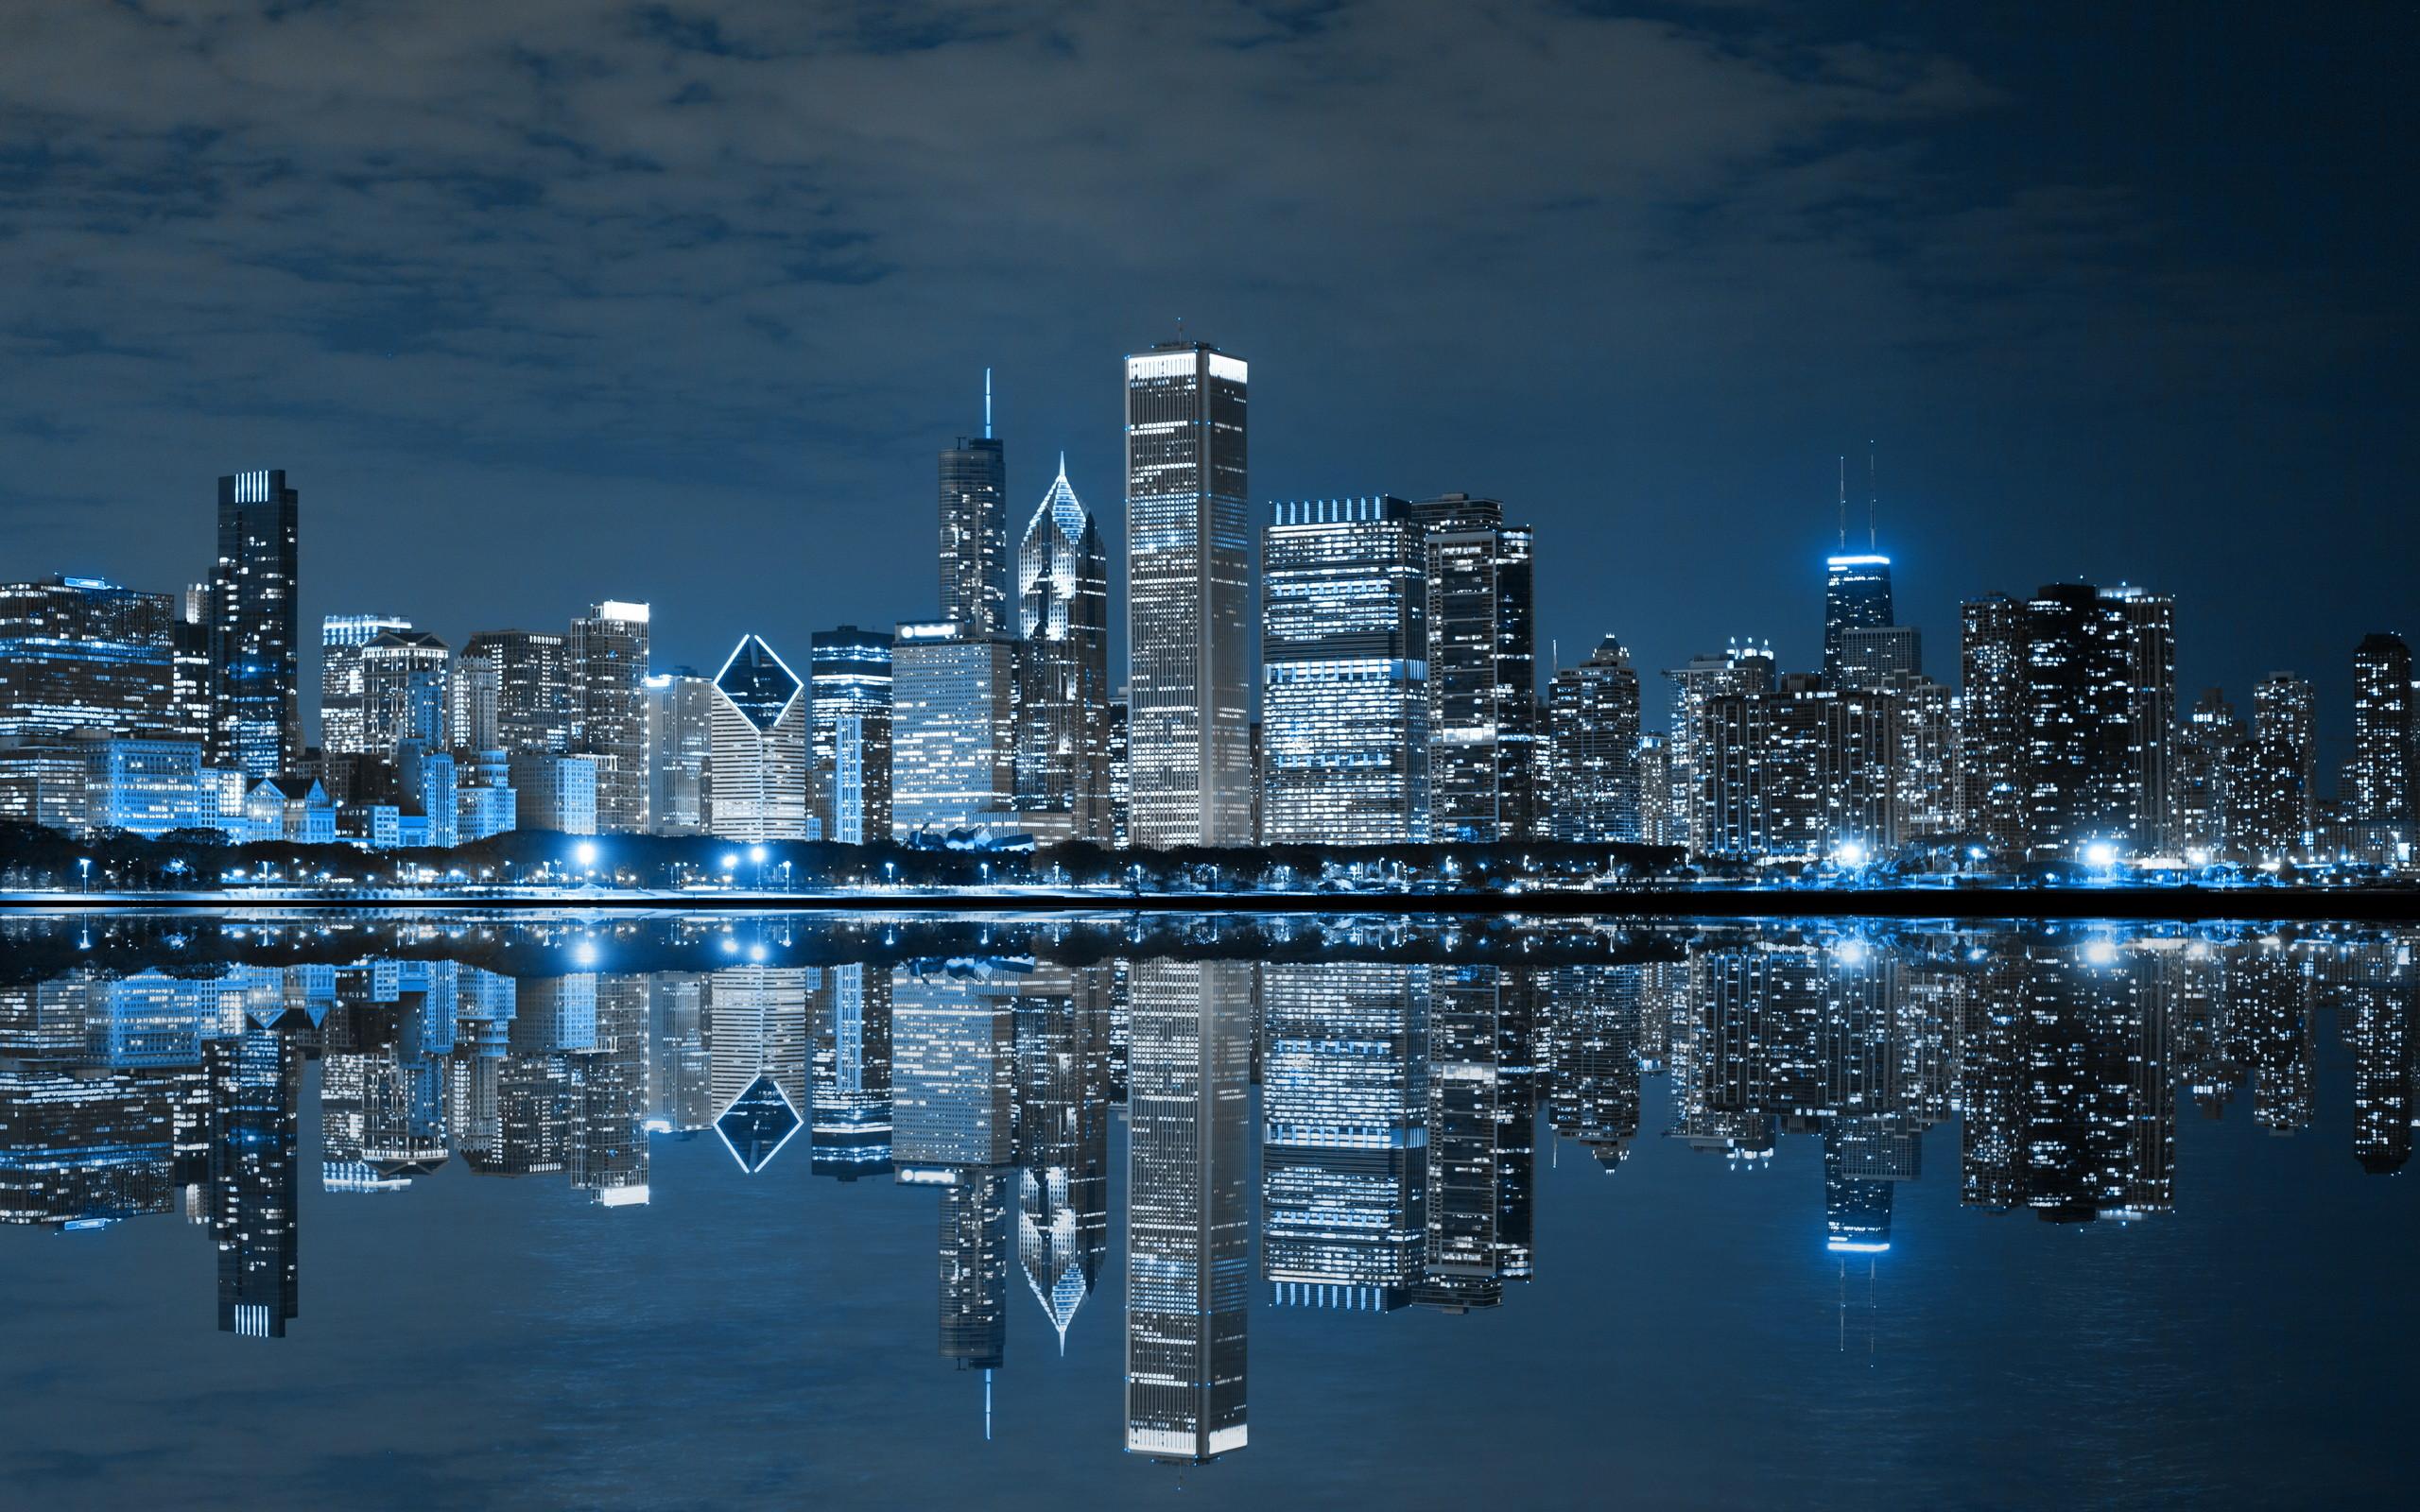 chicago wallpaper iphone 6 – Google Search | Desktop Wallpapers | Pinterest  | Chicago wallpaper